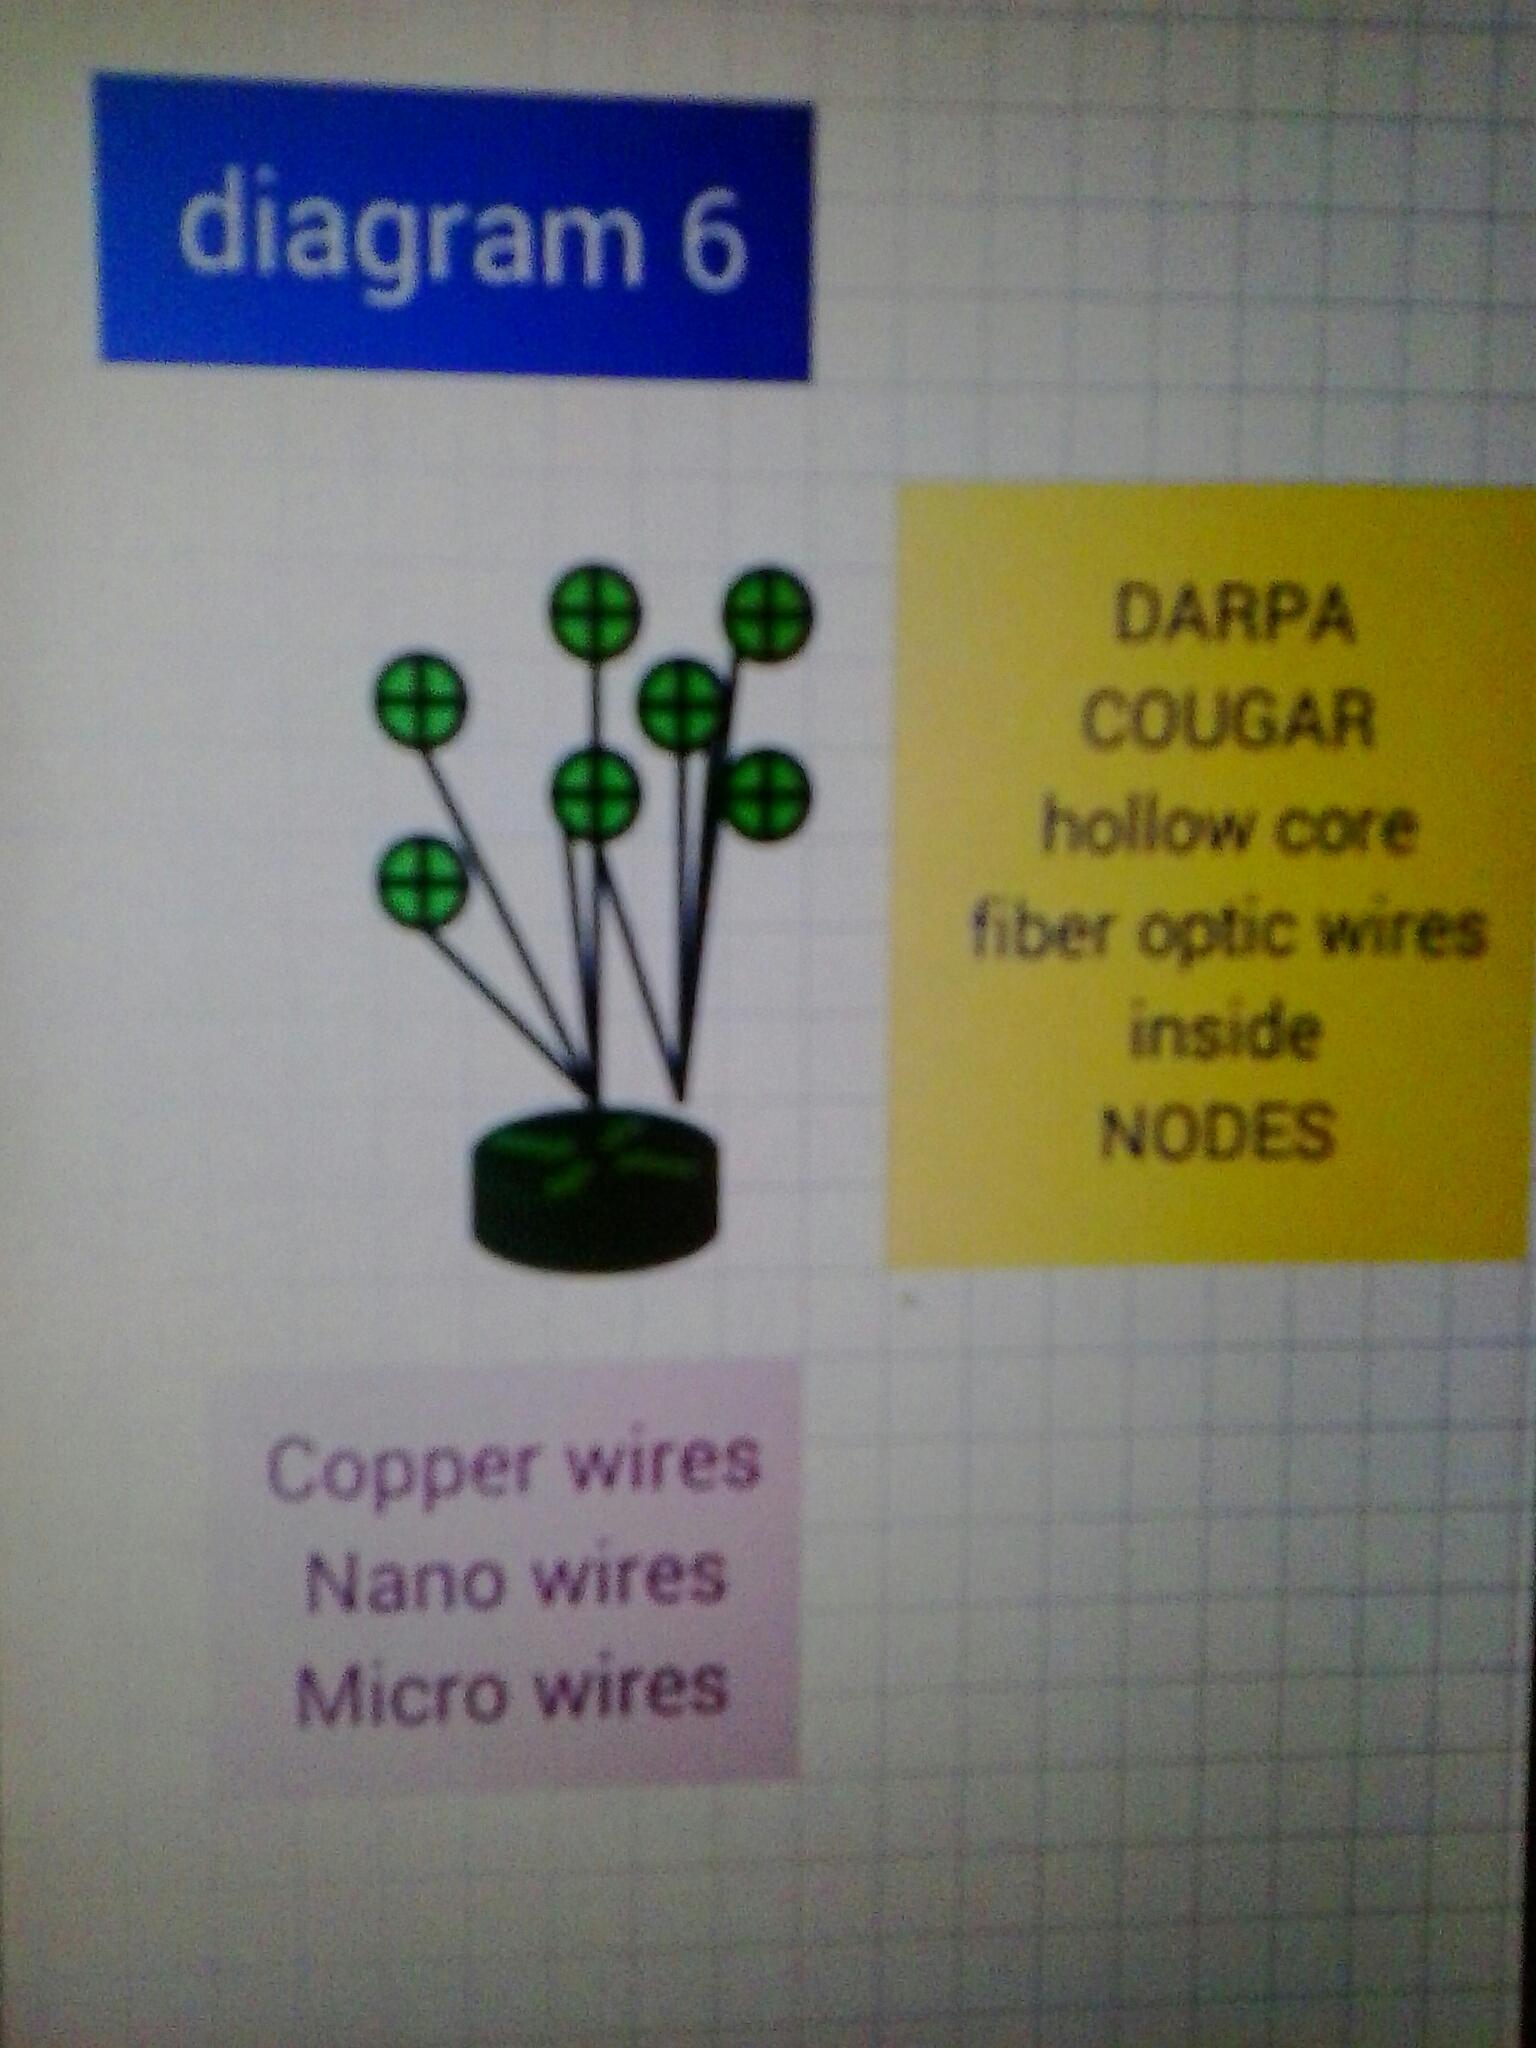 Alien Space Science News Wow Signal Higgs Boson Mu2e Fiber Optic Wiring Diagram 6 Nodes Wires Darpa Cougar Hollow Core Optics Micro Nanowires